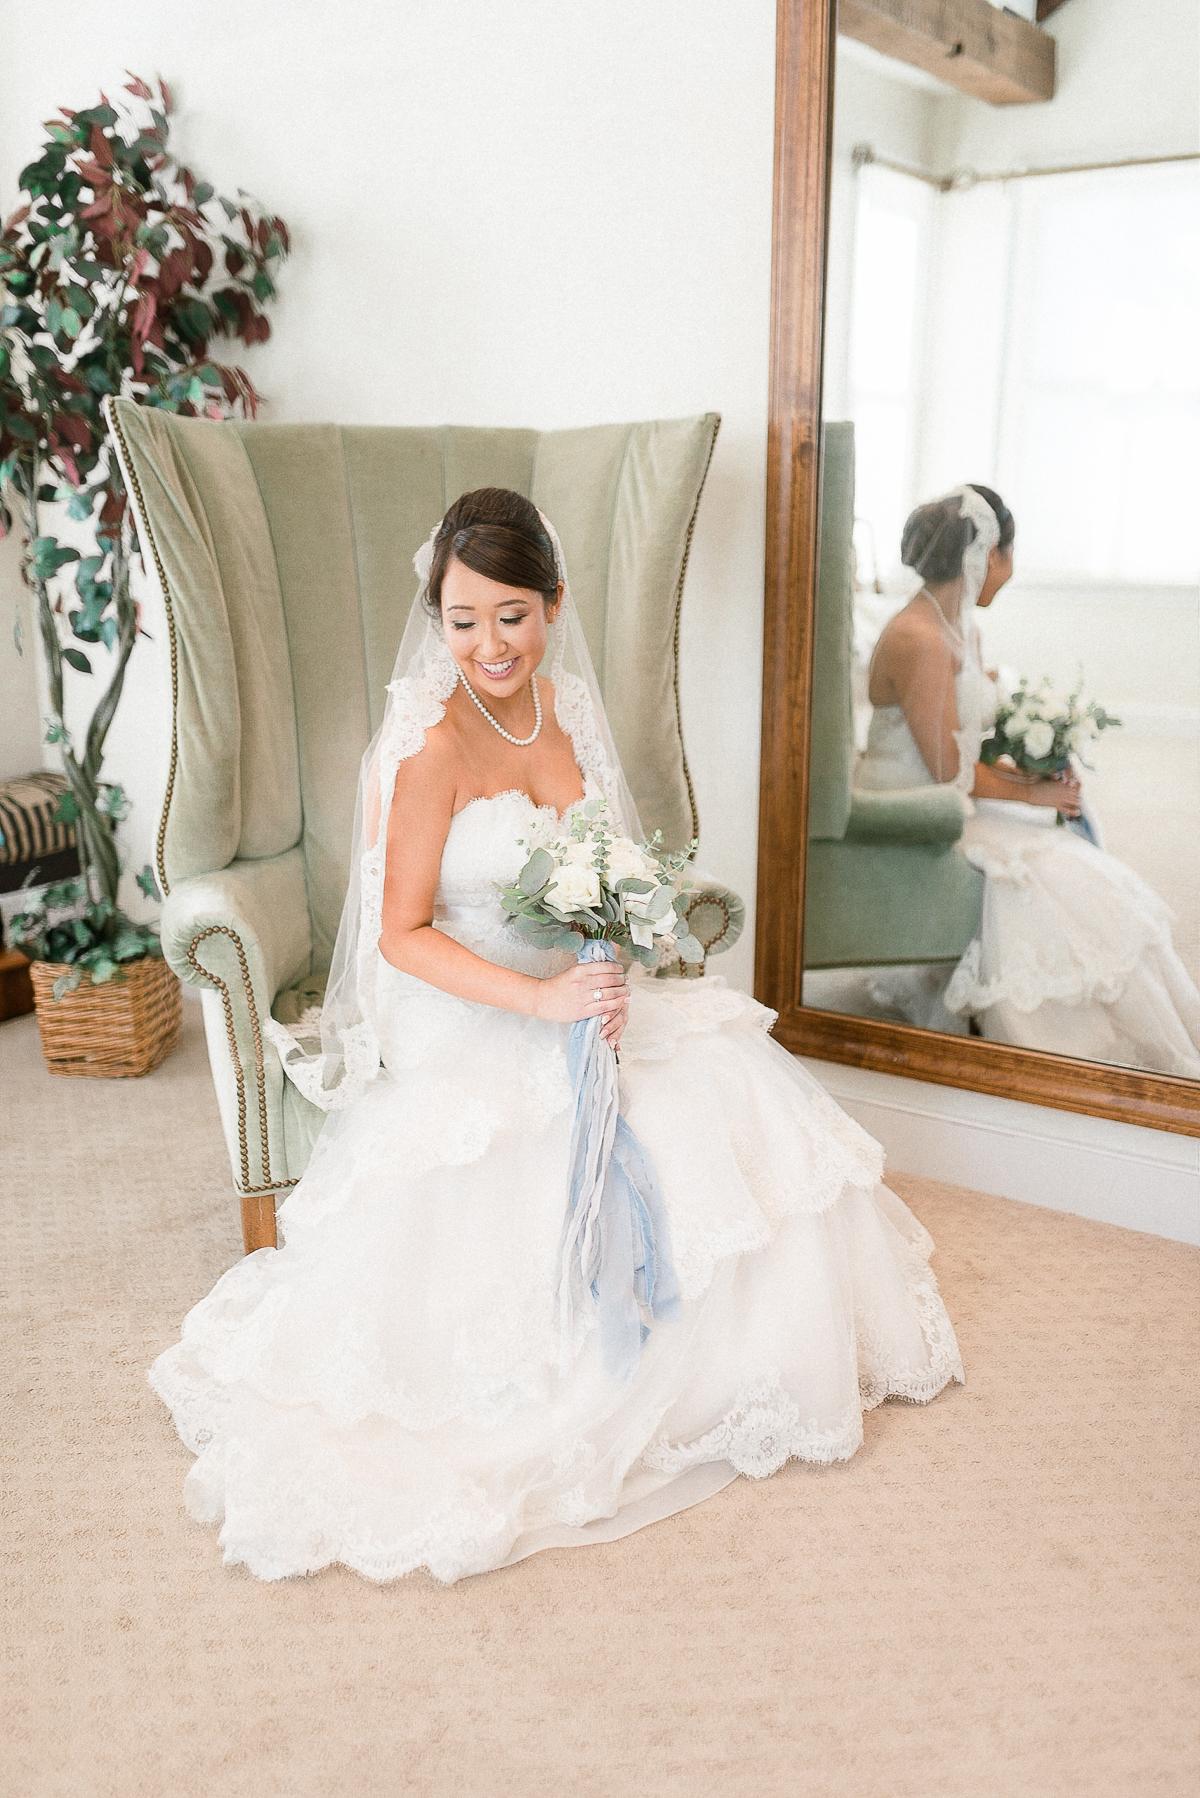 MD-Walkers-Overlook-Wedding-Bride-Get-Ready-28.jpg